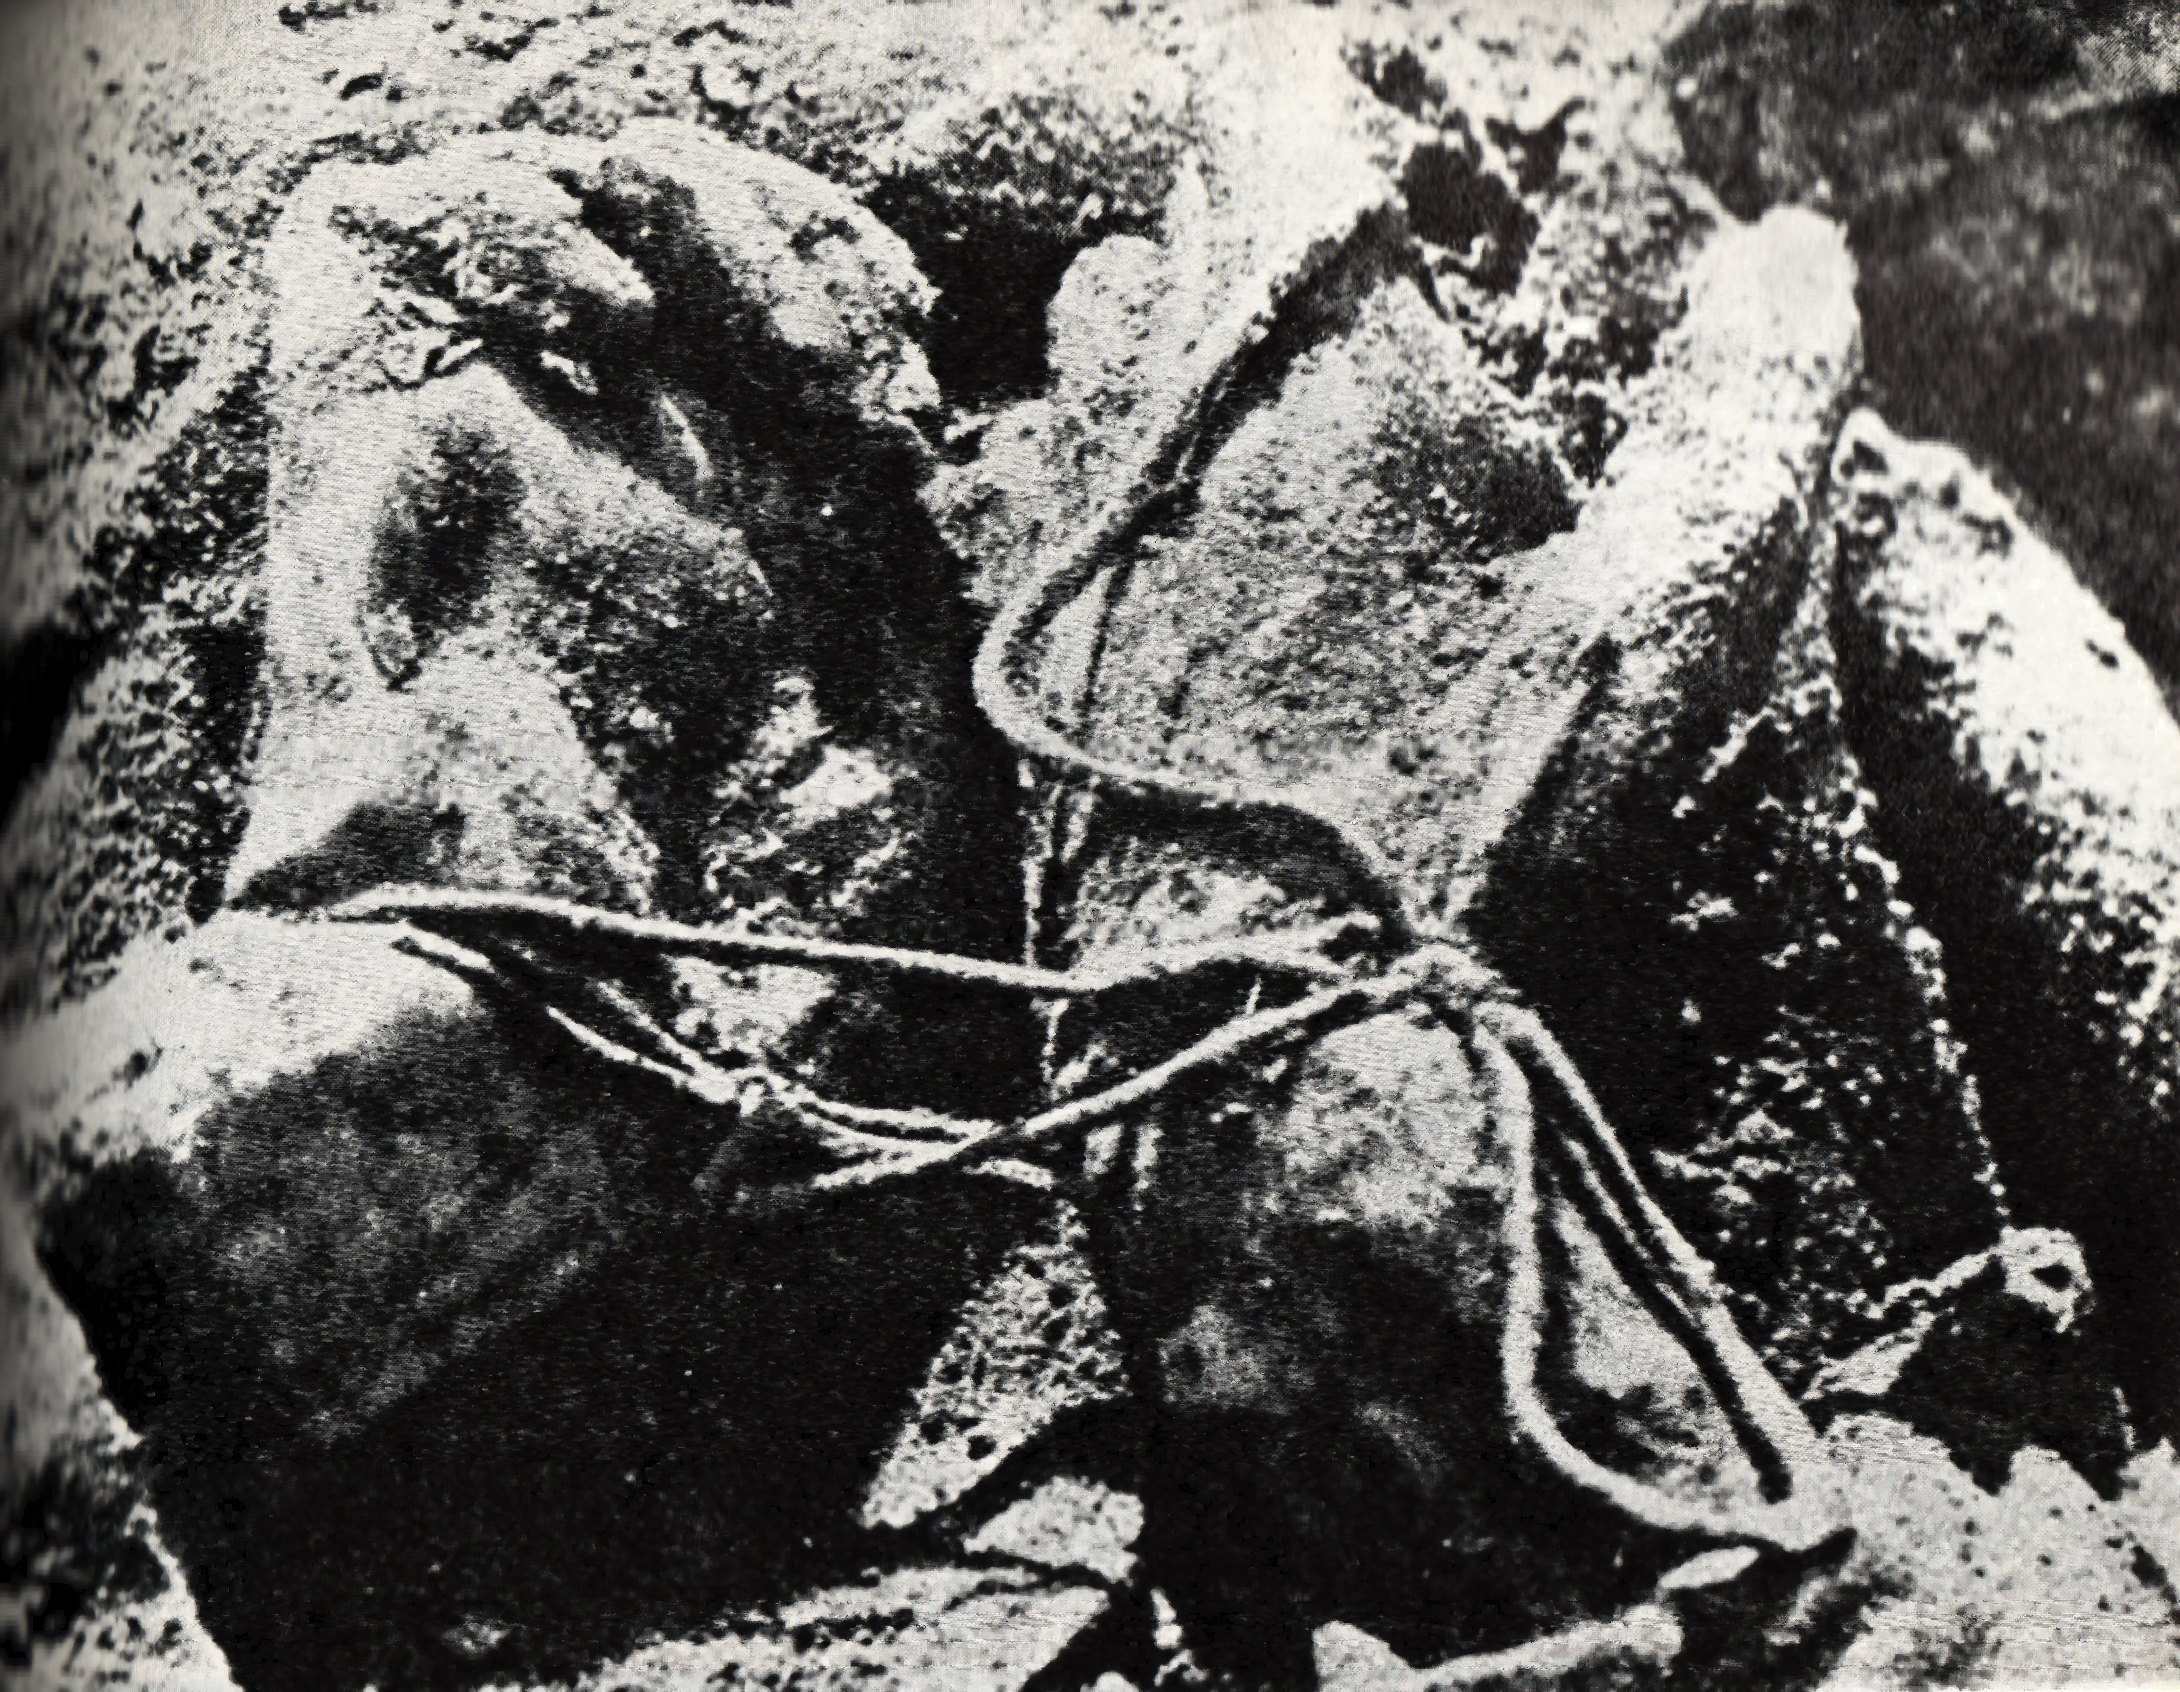 https://i1.wp.com/upload.wikimedia.org/wikipedia/commons/8/8c/Katyn_massacre.jpg